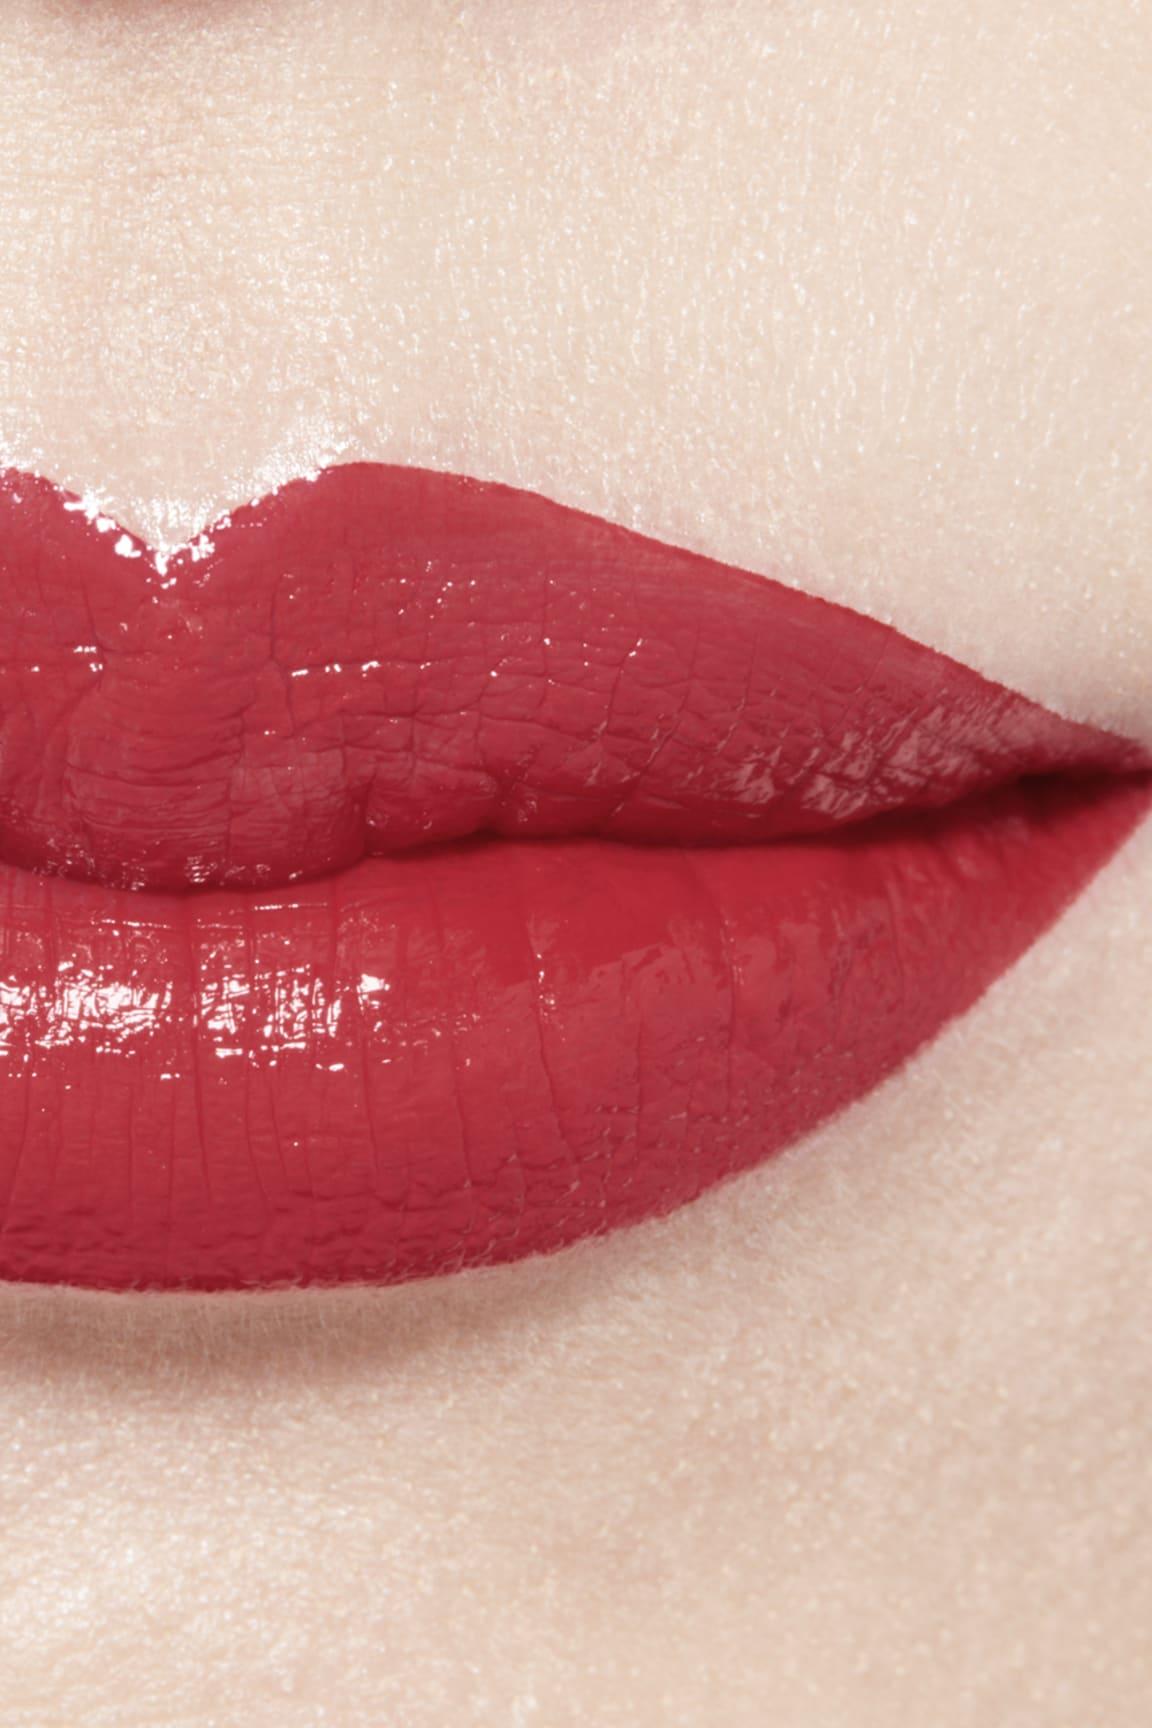 Application makeup visual 1 - ROUGE COCO BLOOM 132 - VIVACITY